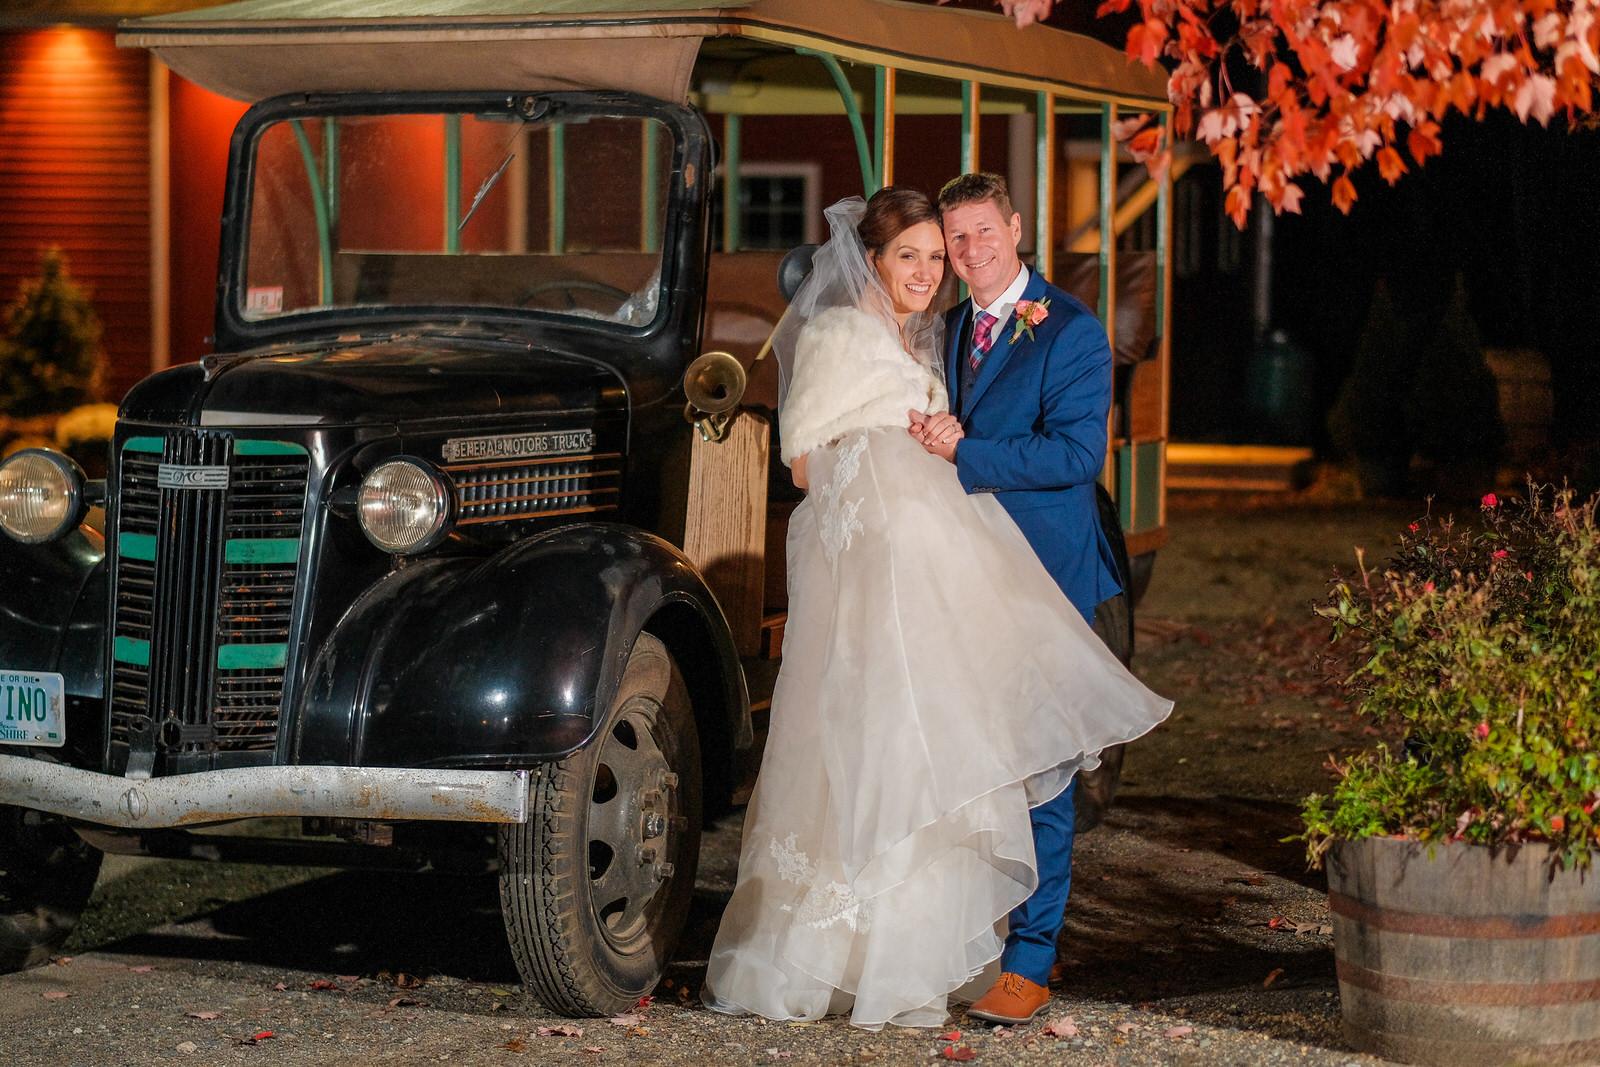 Zorvino-Vineyards-Fall-Wedding-Photography-609.jpg